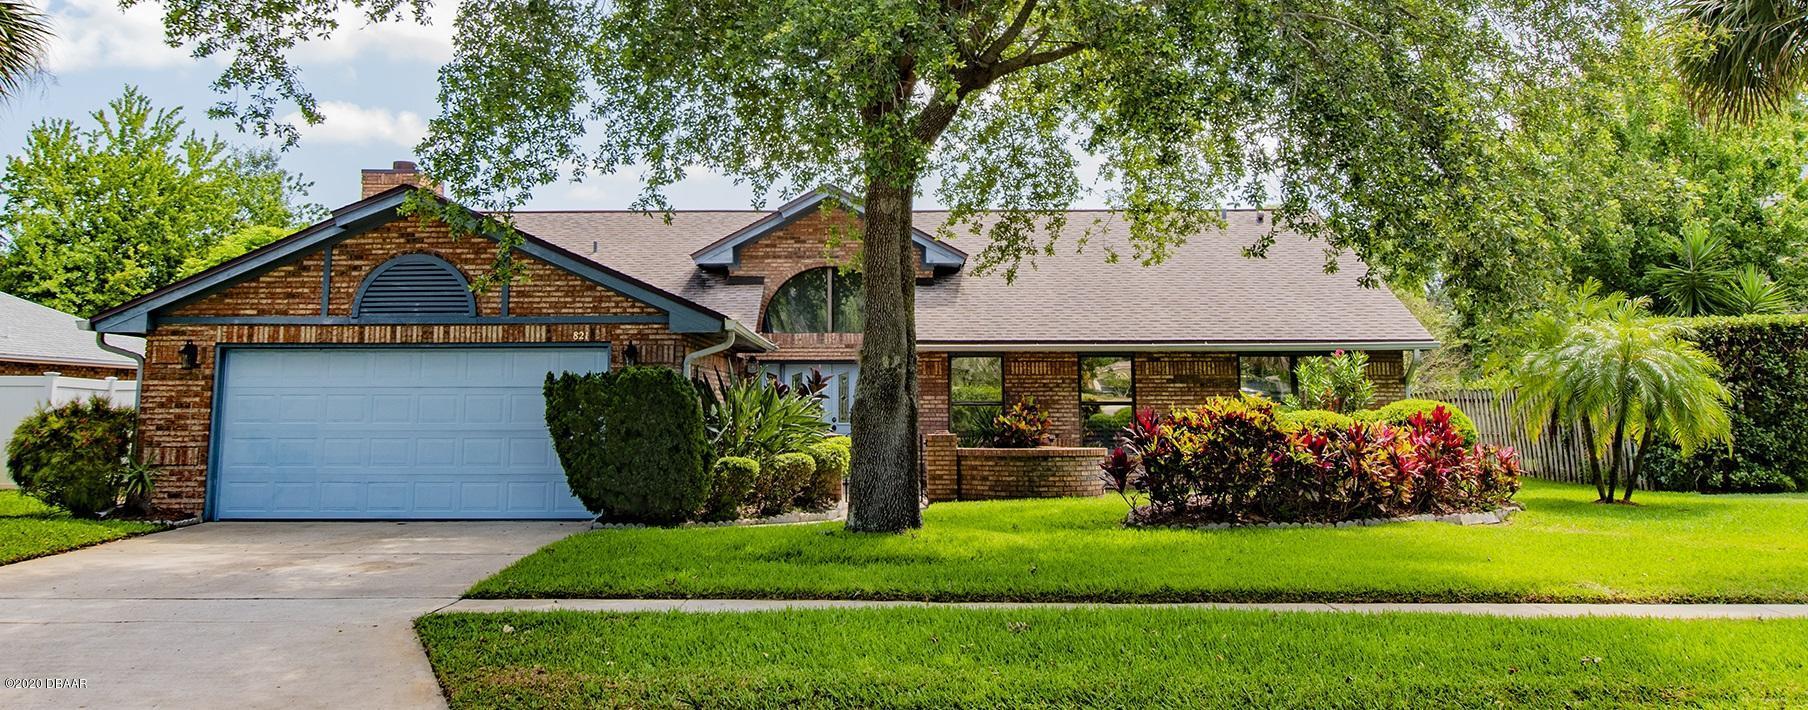 Photo of 821 Clear Lake Drive, Port Orange, FL 32127